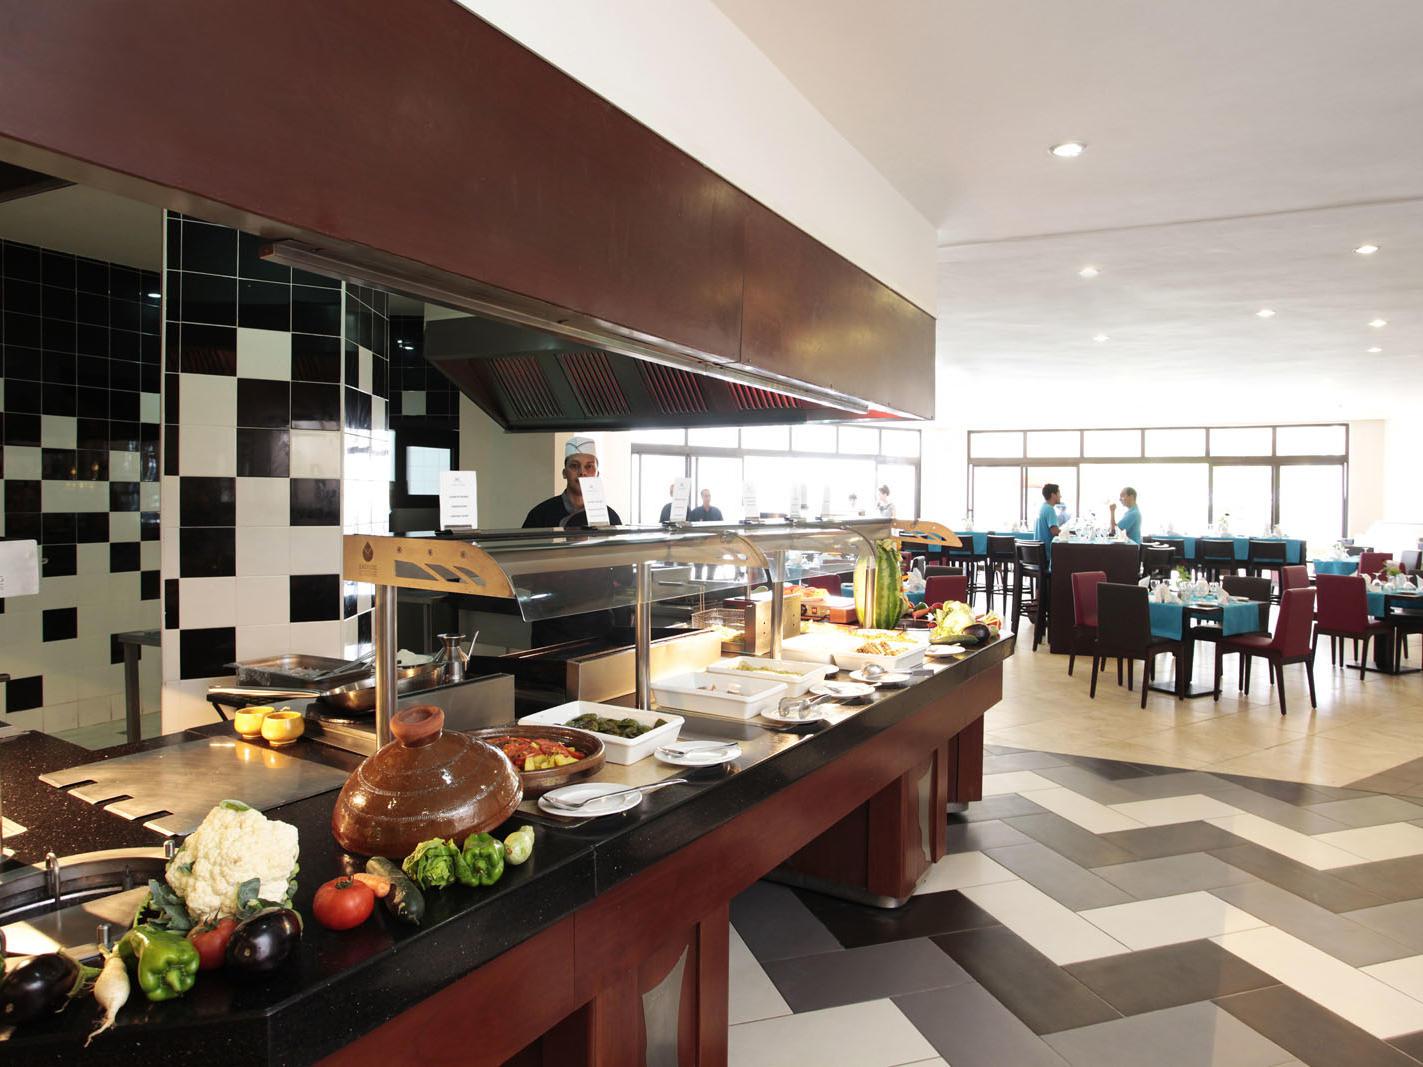 Buffet at Kenzi Europa All Inclusive Hotel in Agadir, Morocco